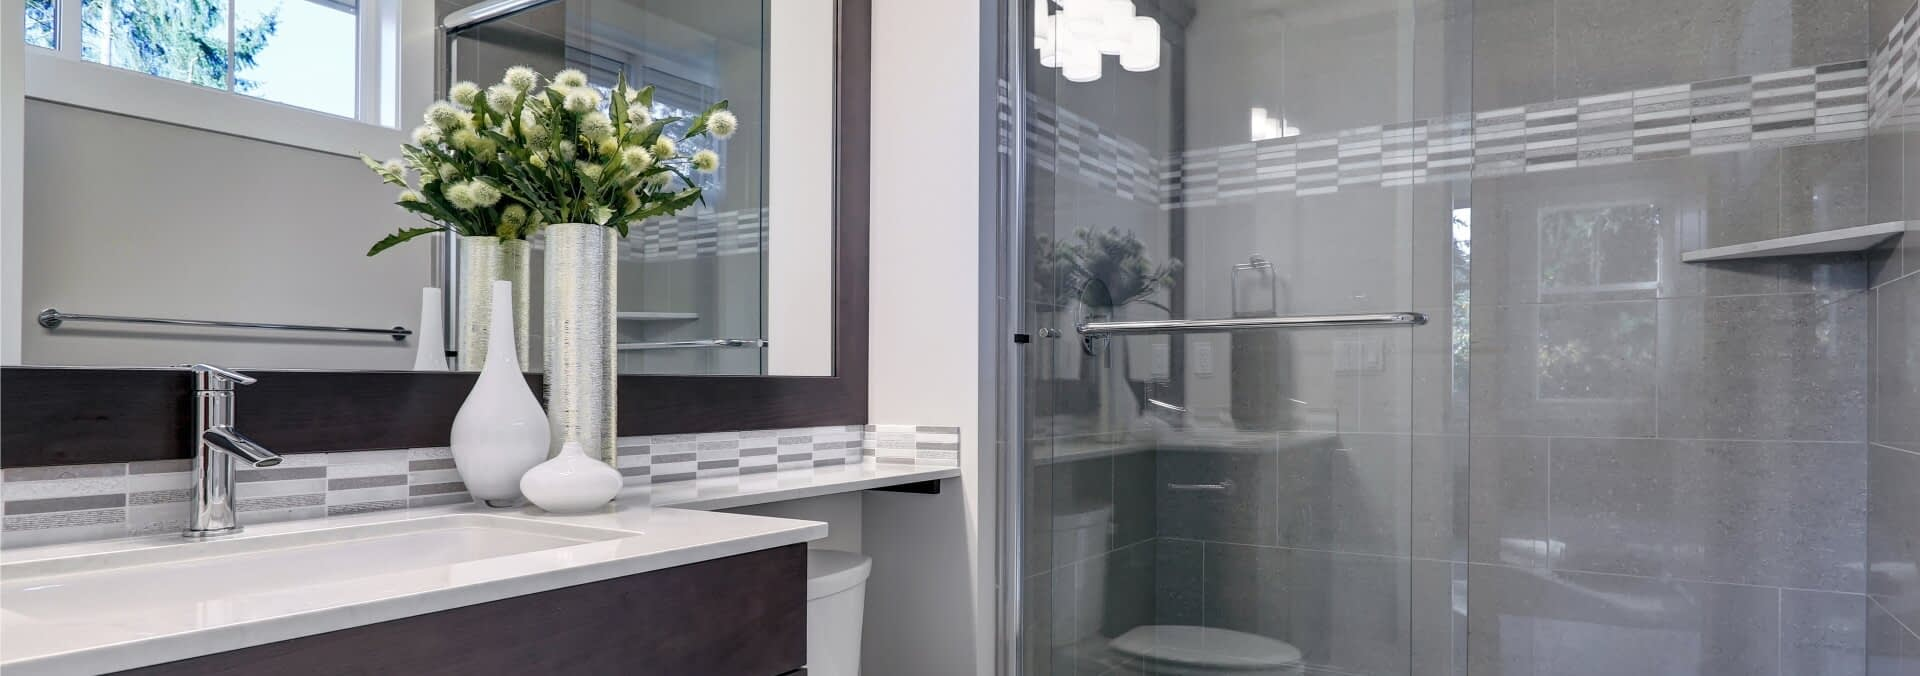 Premium Quality Bathroom Renovations